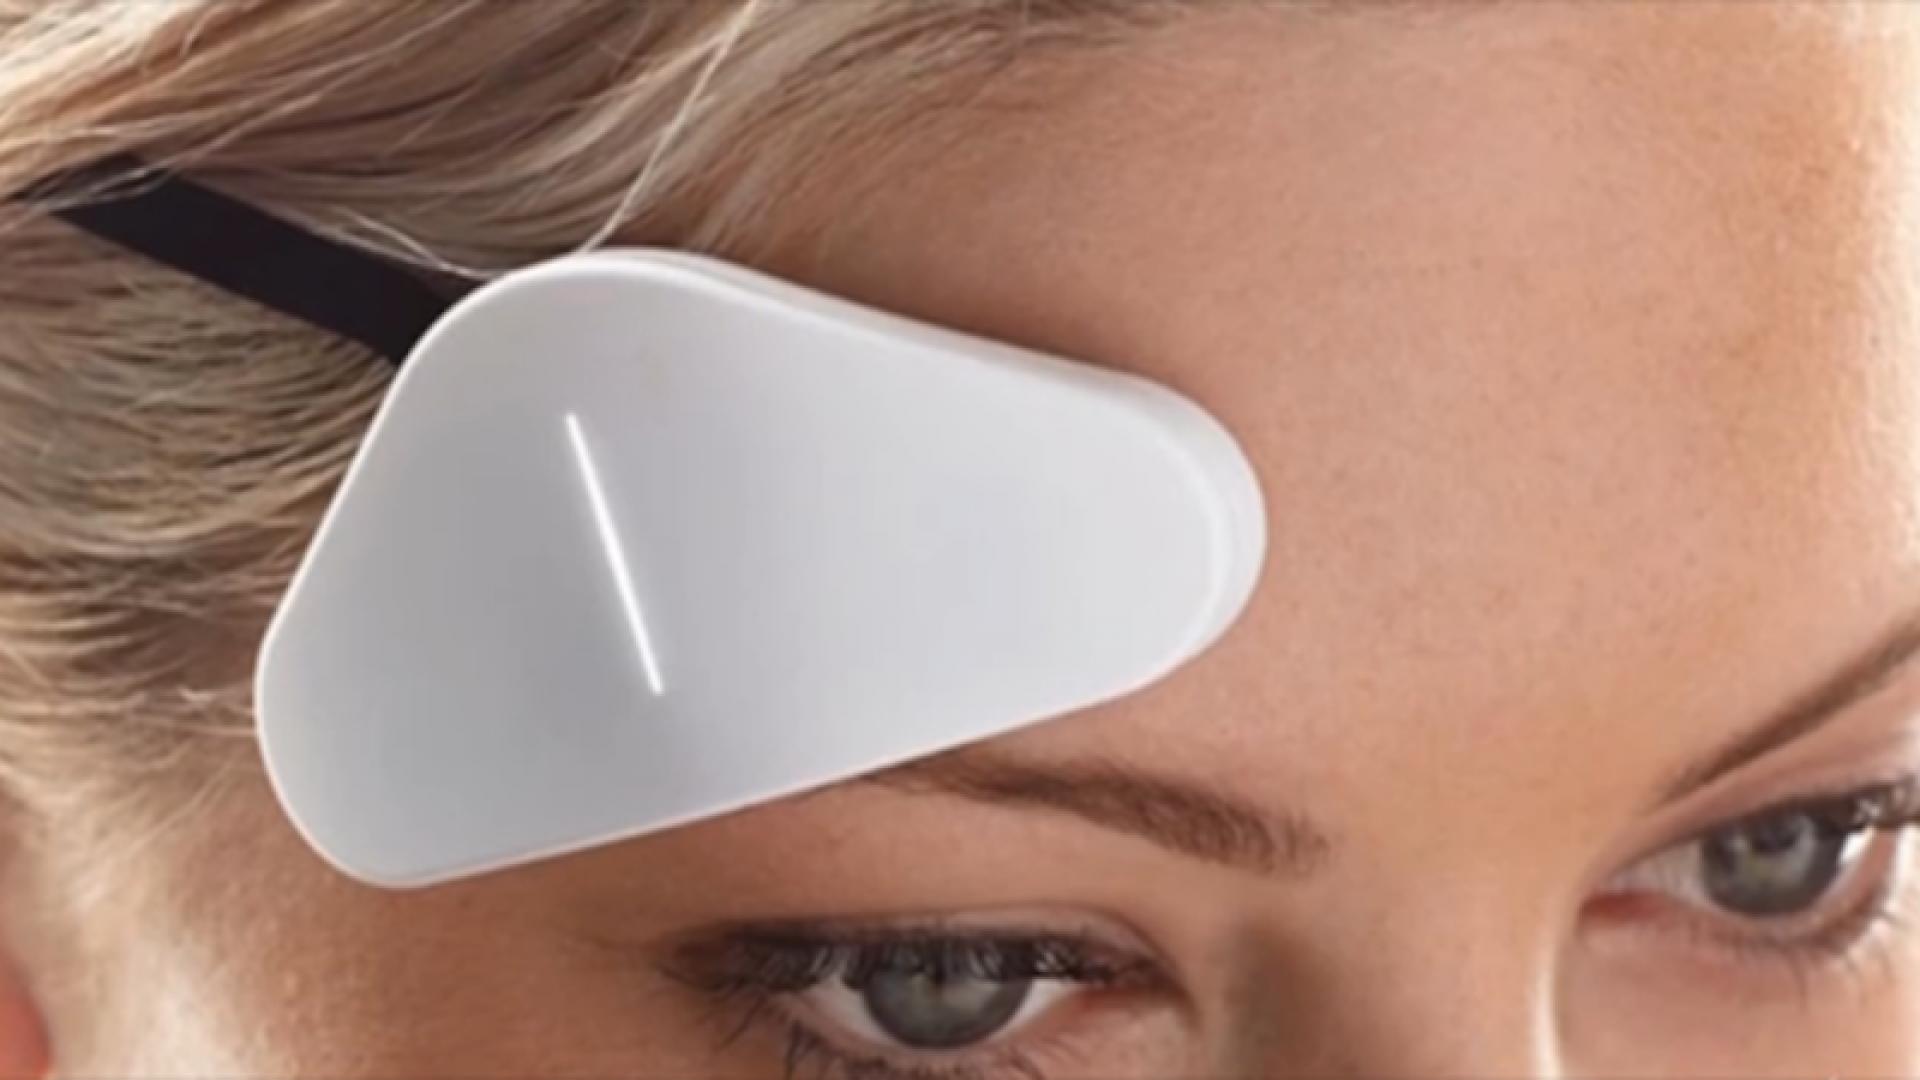 Thync's wearable headband device.